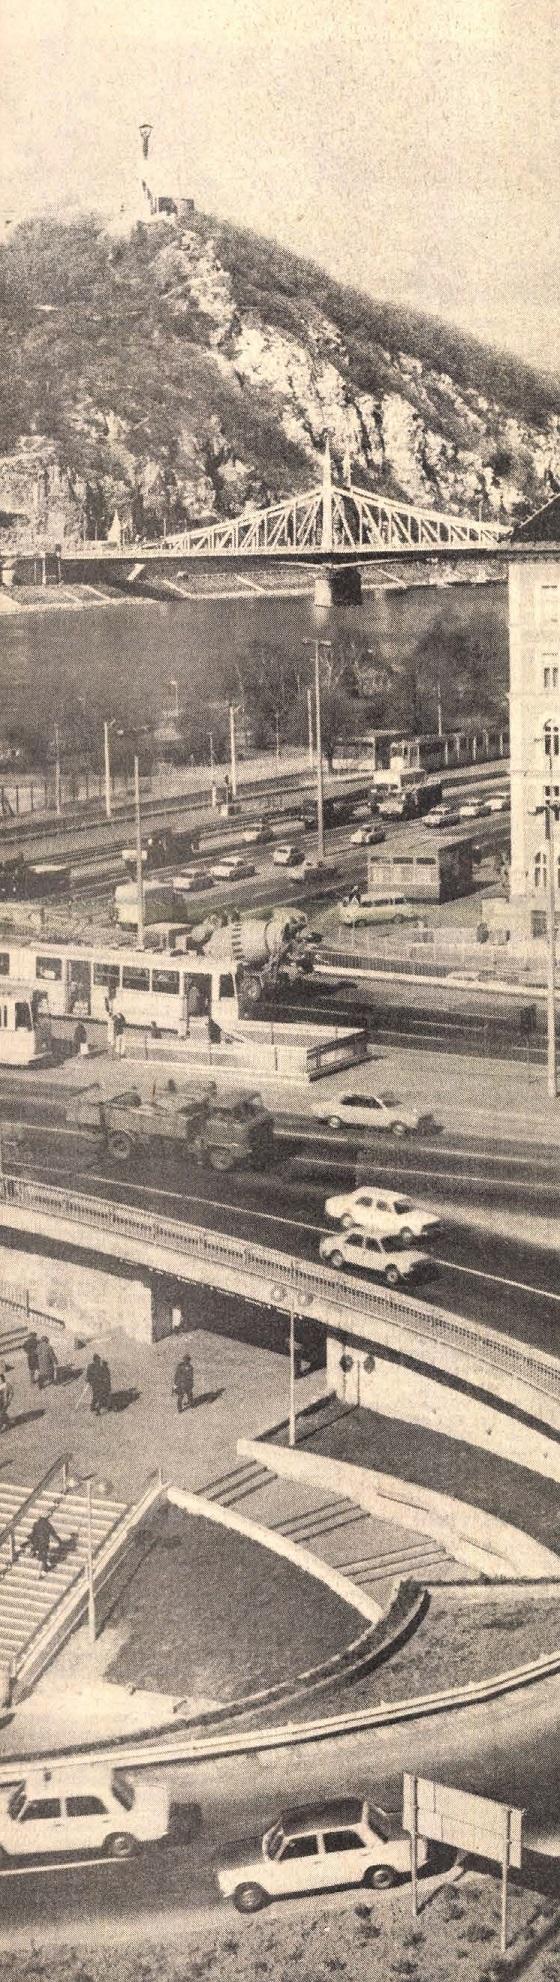 idokapszula_nb_i_1983_84_torokorszag_magyarorszag_budapest.jpg